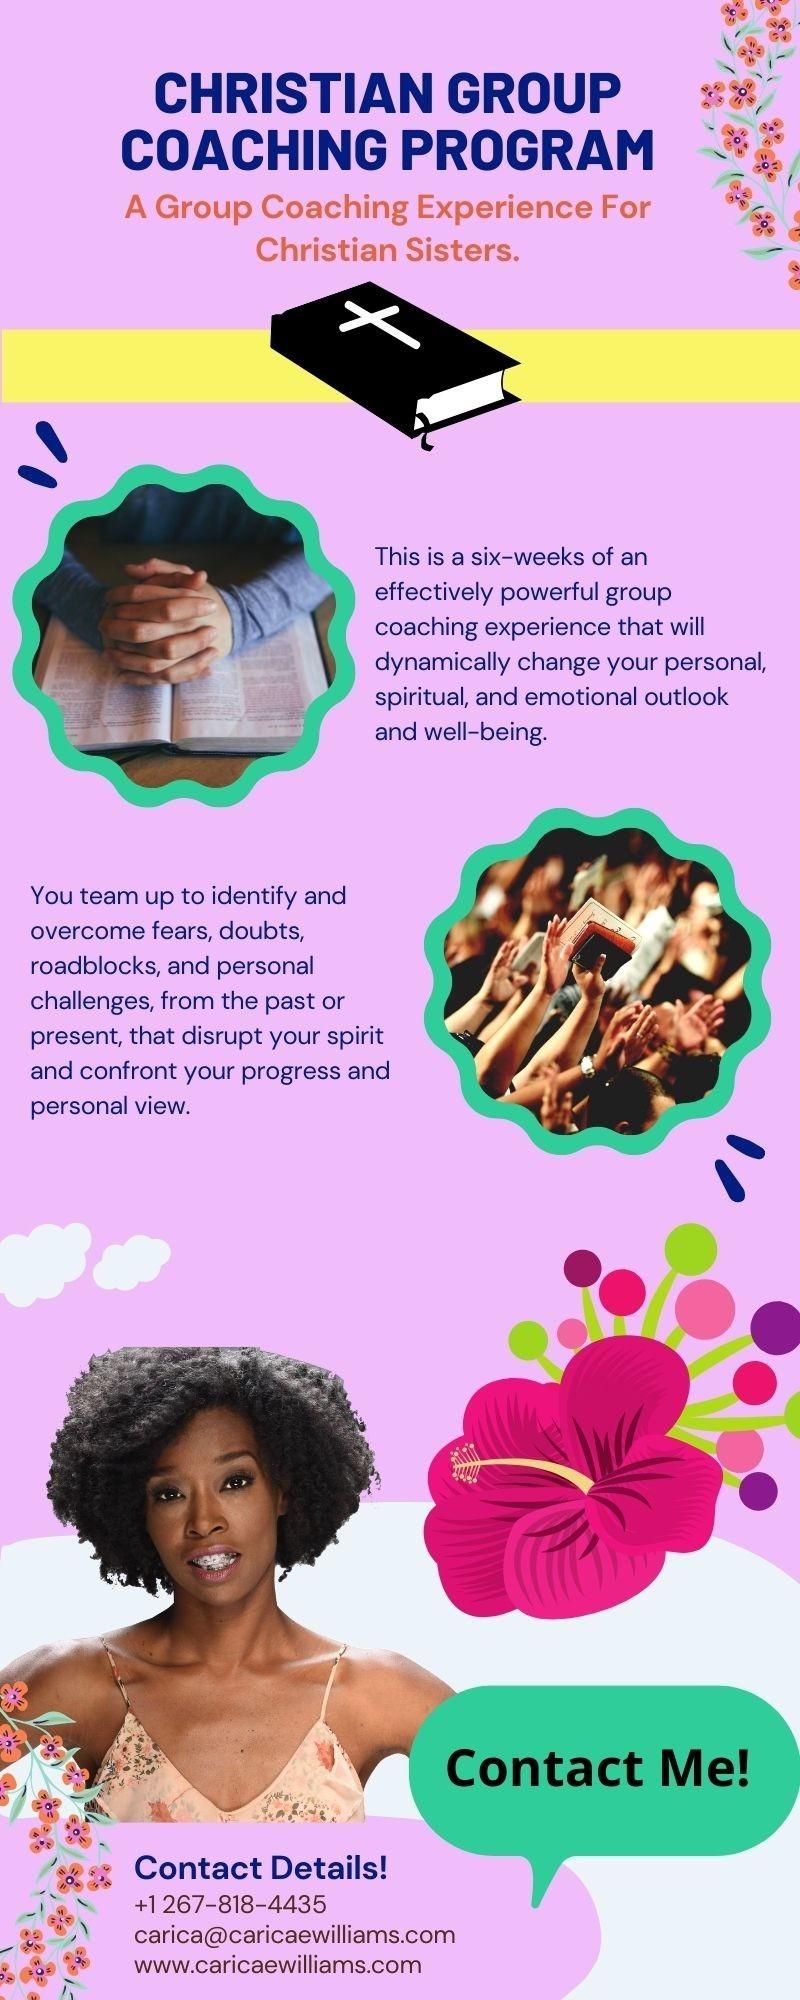 Christian Group Coaching Program | Carica E. Williams